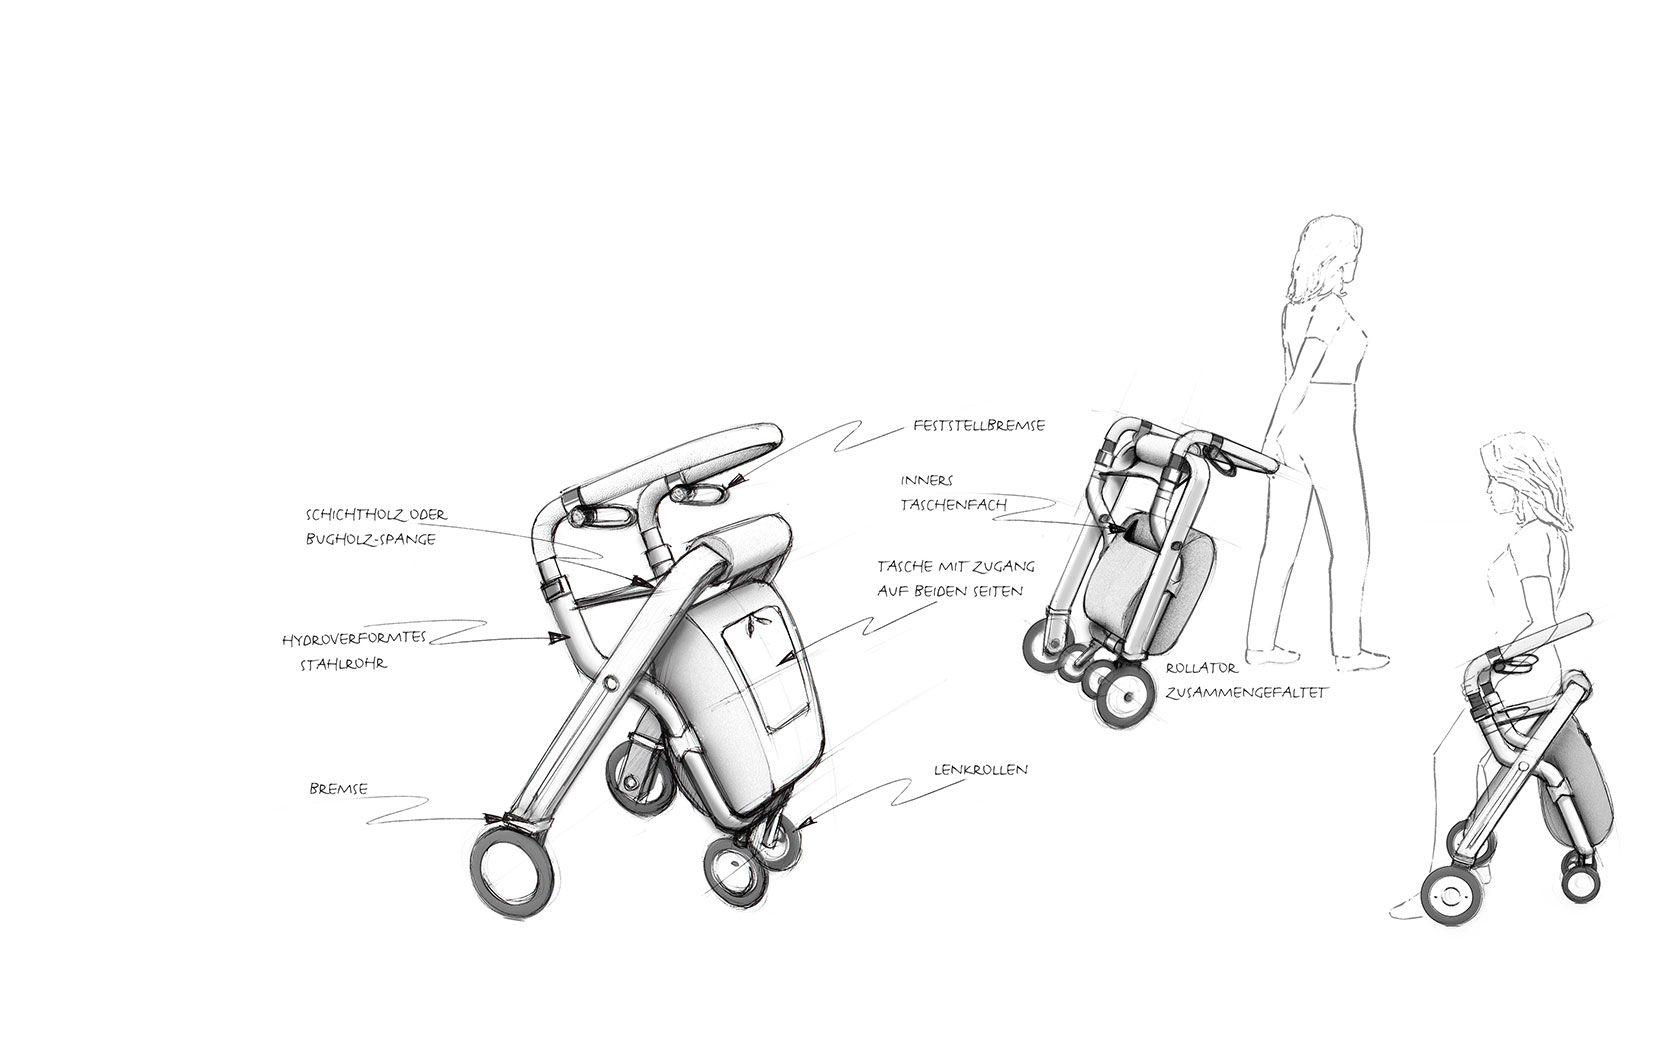 Rollator3.jpg (1680×1050)